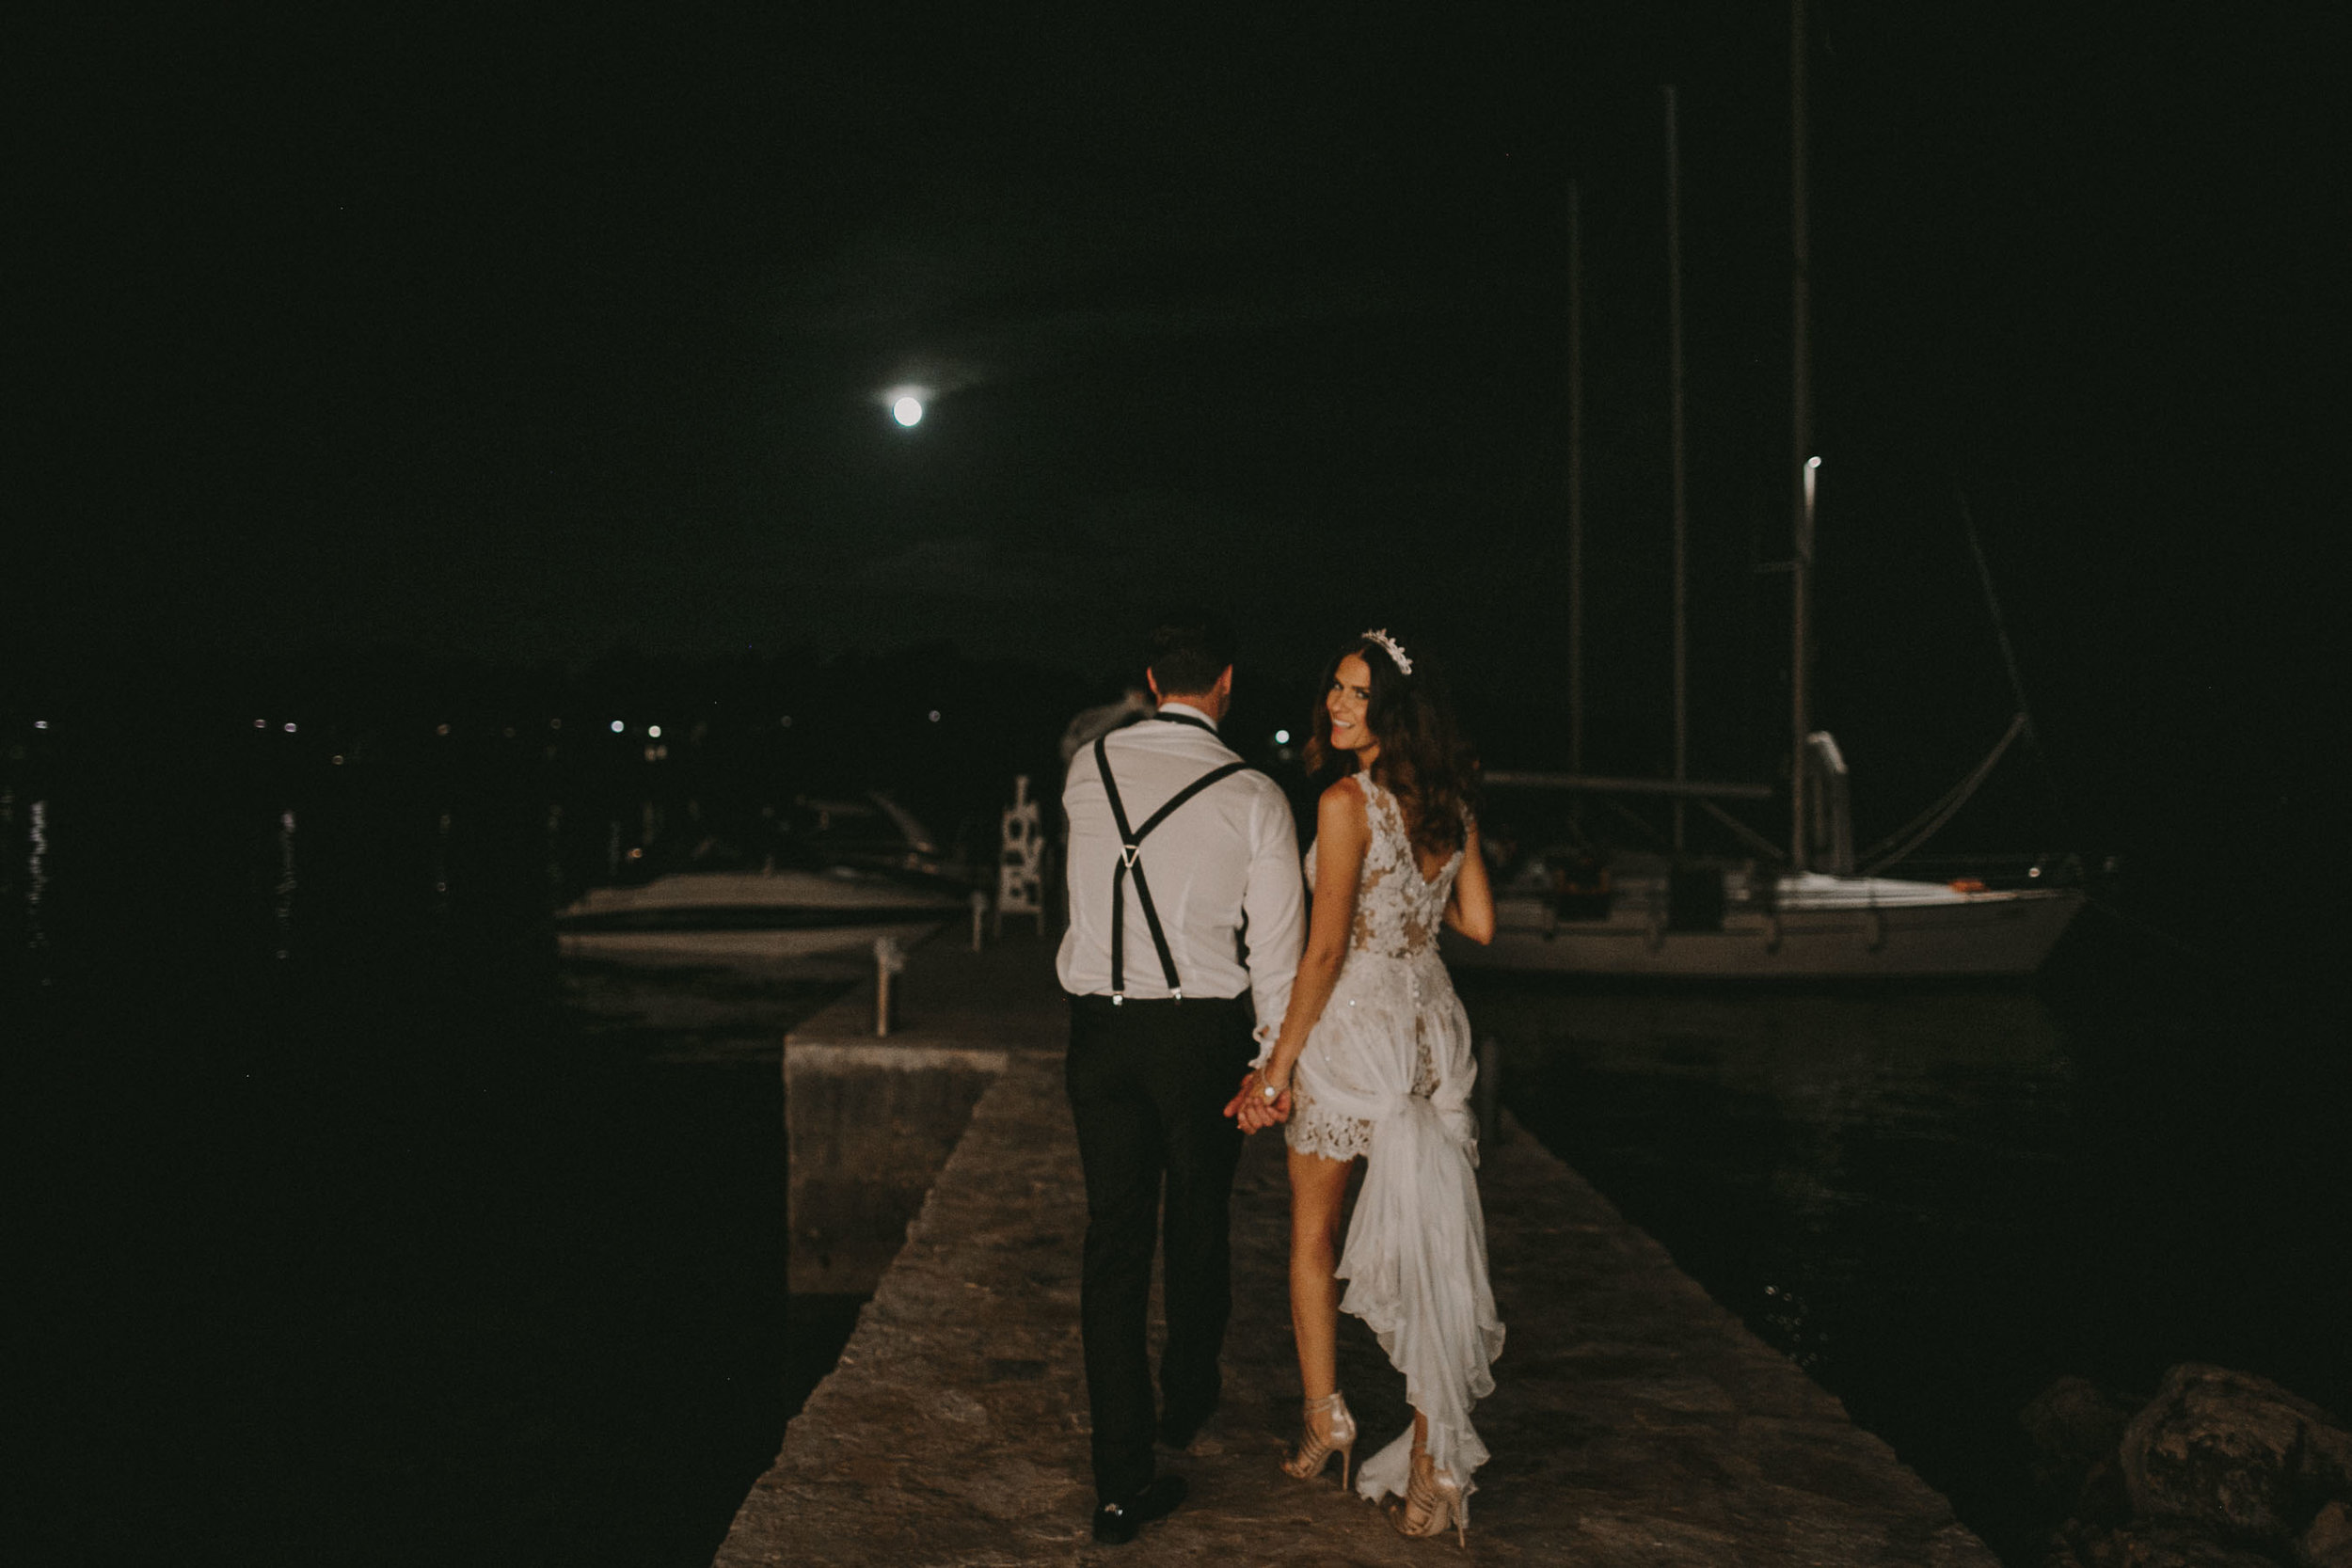 sylvia&dimitri-Wedding-Crvena_Luka-Croatia-106(9542).jpg